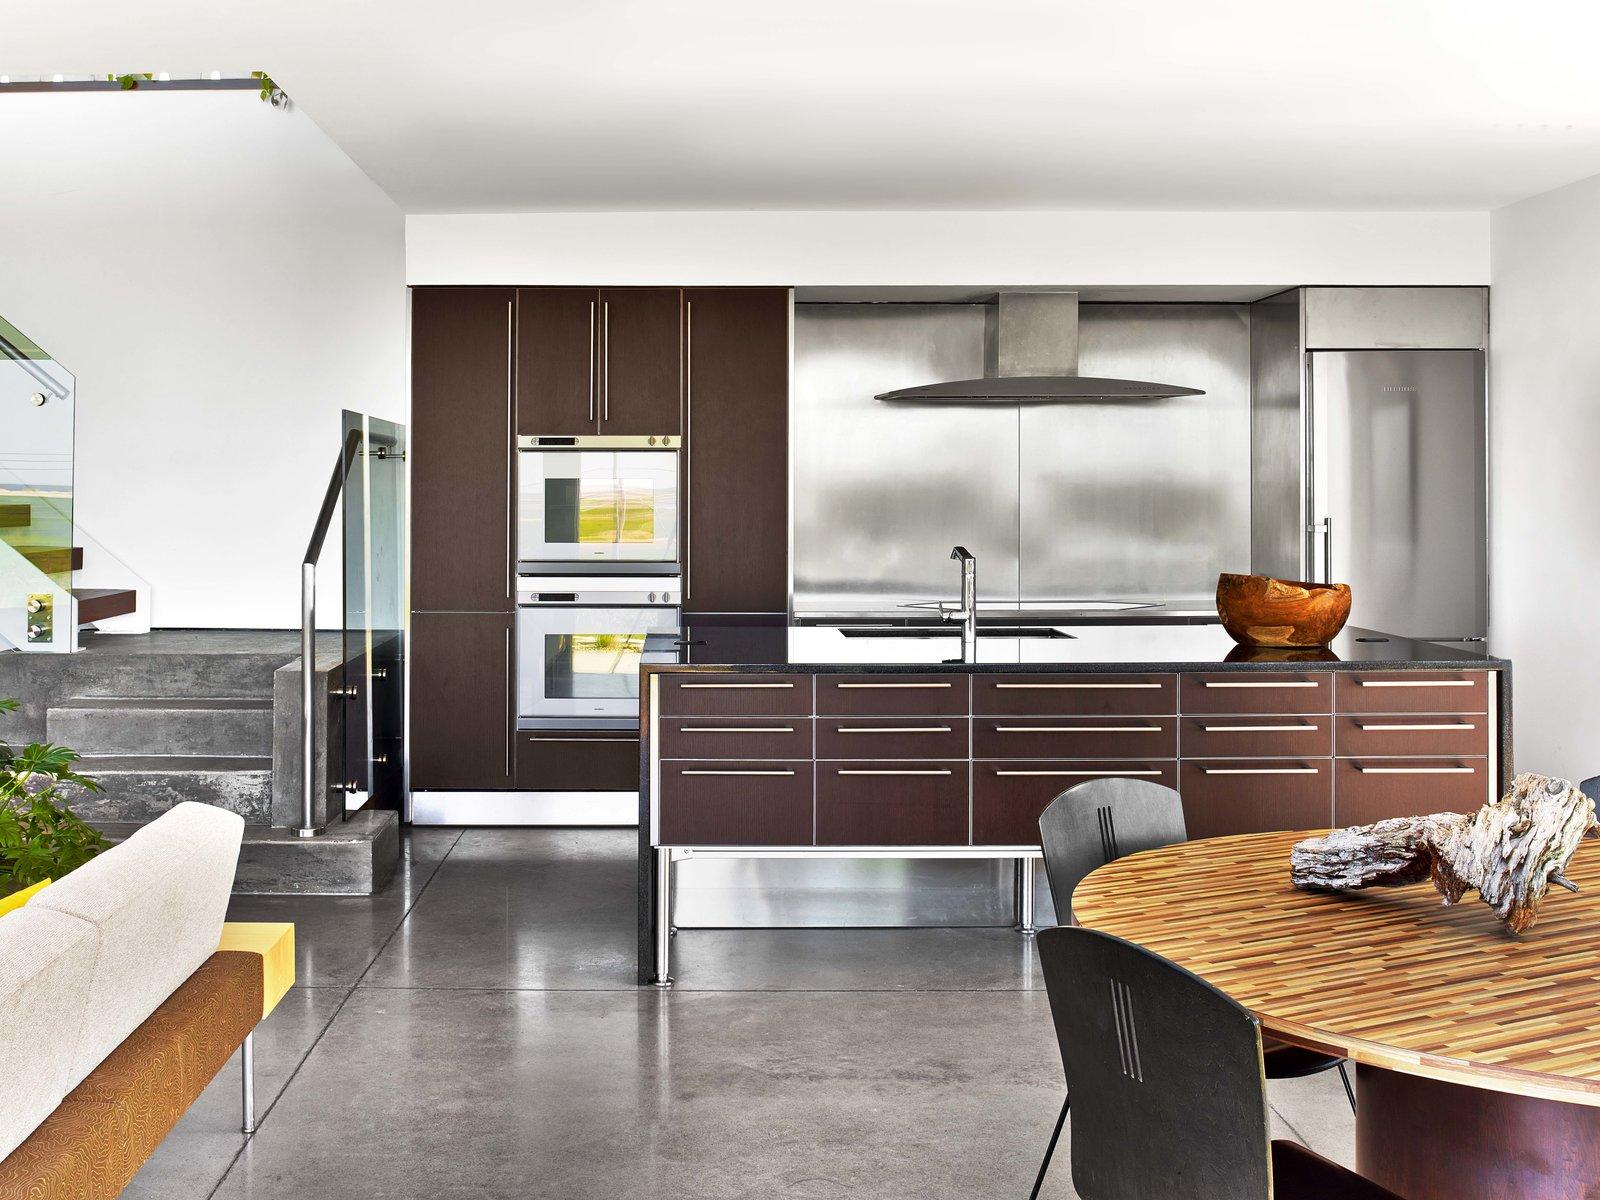 Kitchen, Refrigerator, and Wall Oven  Cape Cod - Beach House by Hariri & Hariri Architecture